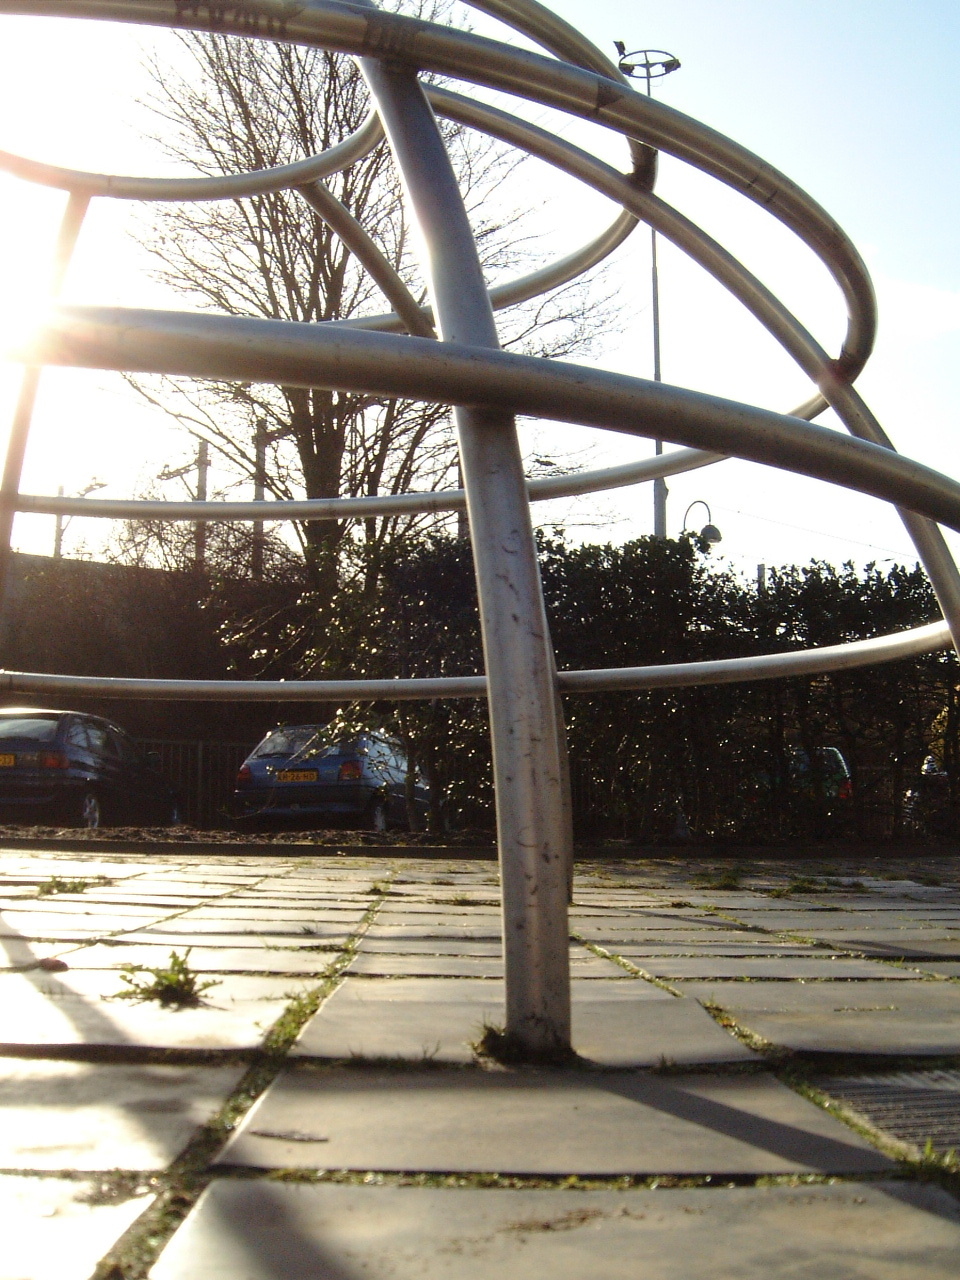 maartent climbing children playground dome sun shining bright